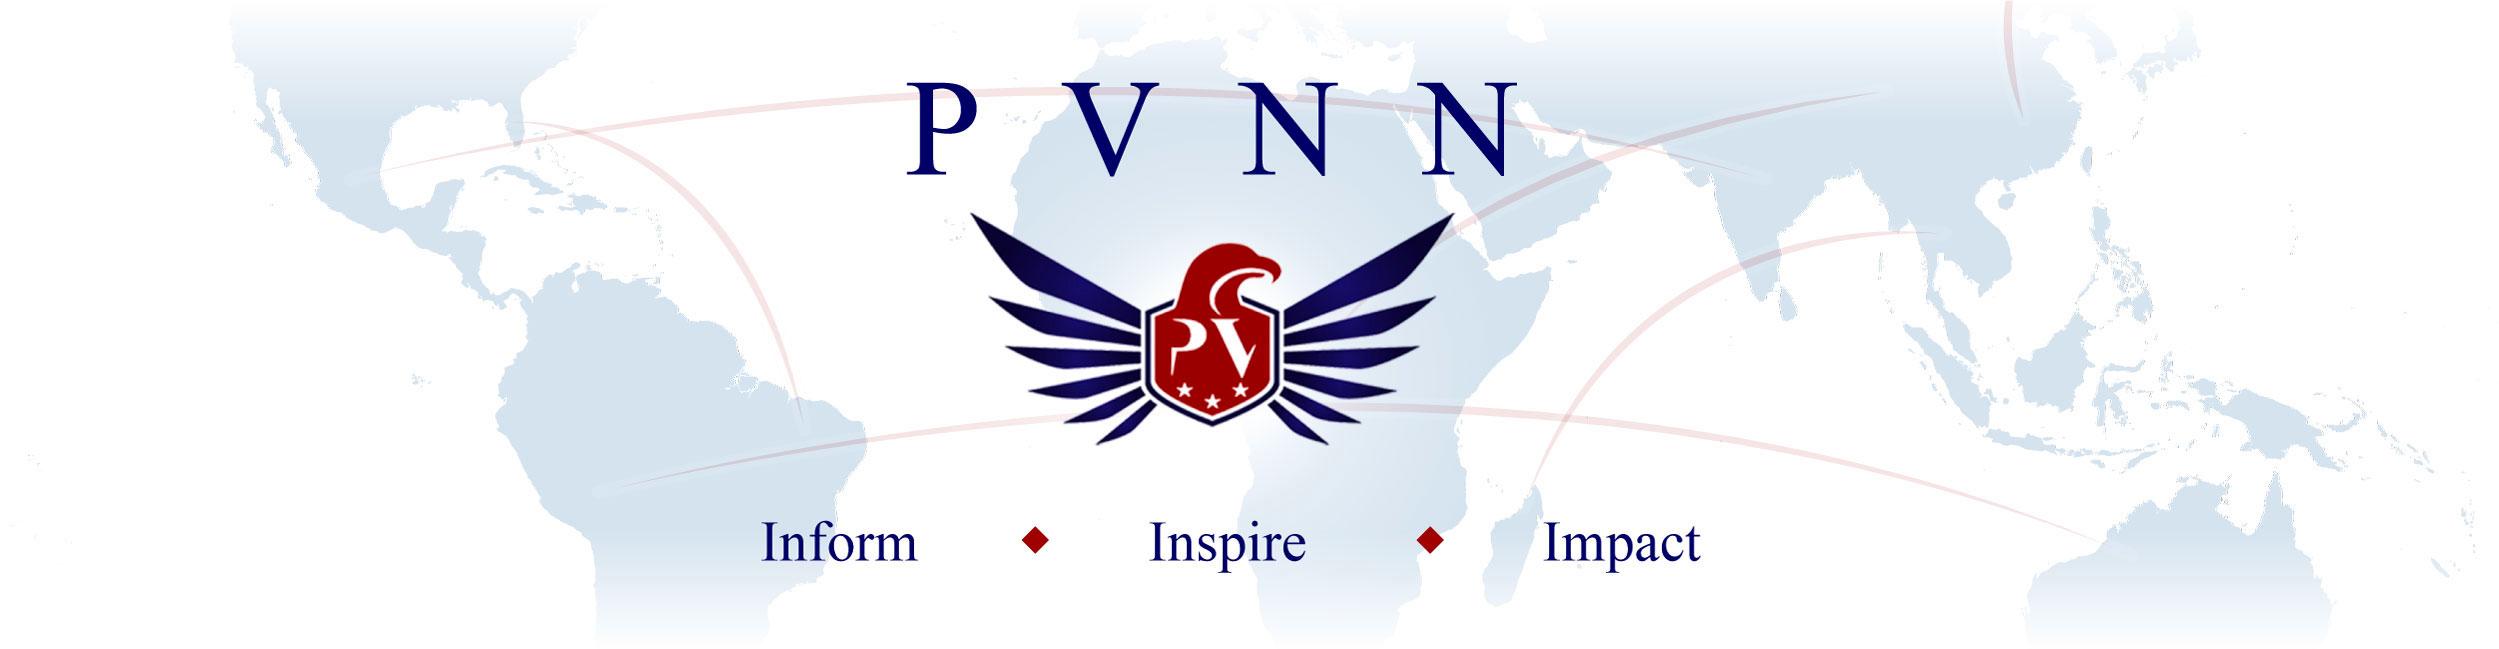 PVNN Inc. (NPO) Logo